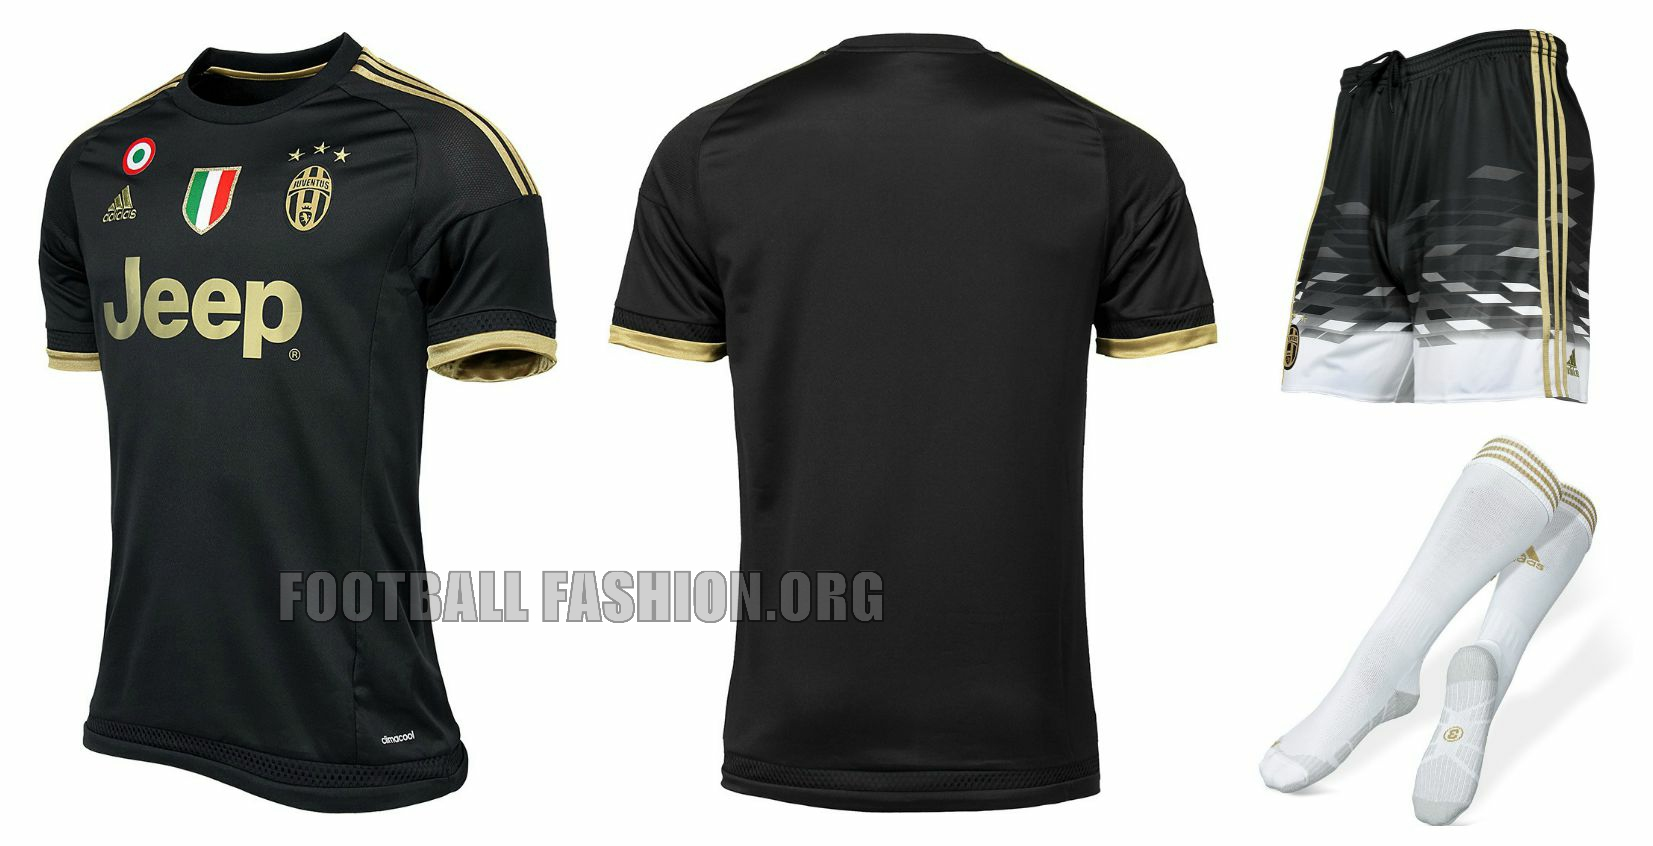 quality design cd3b7 7c2d1 Juventus 2015/16 adidas Third Kit - FOOTBALL FASHION.ORG